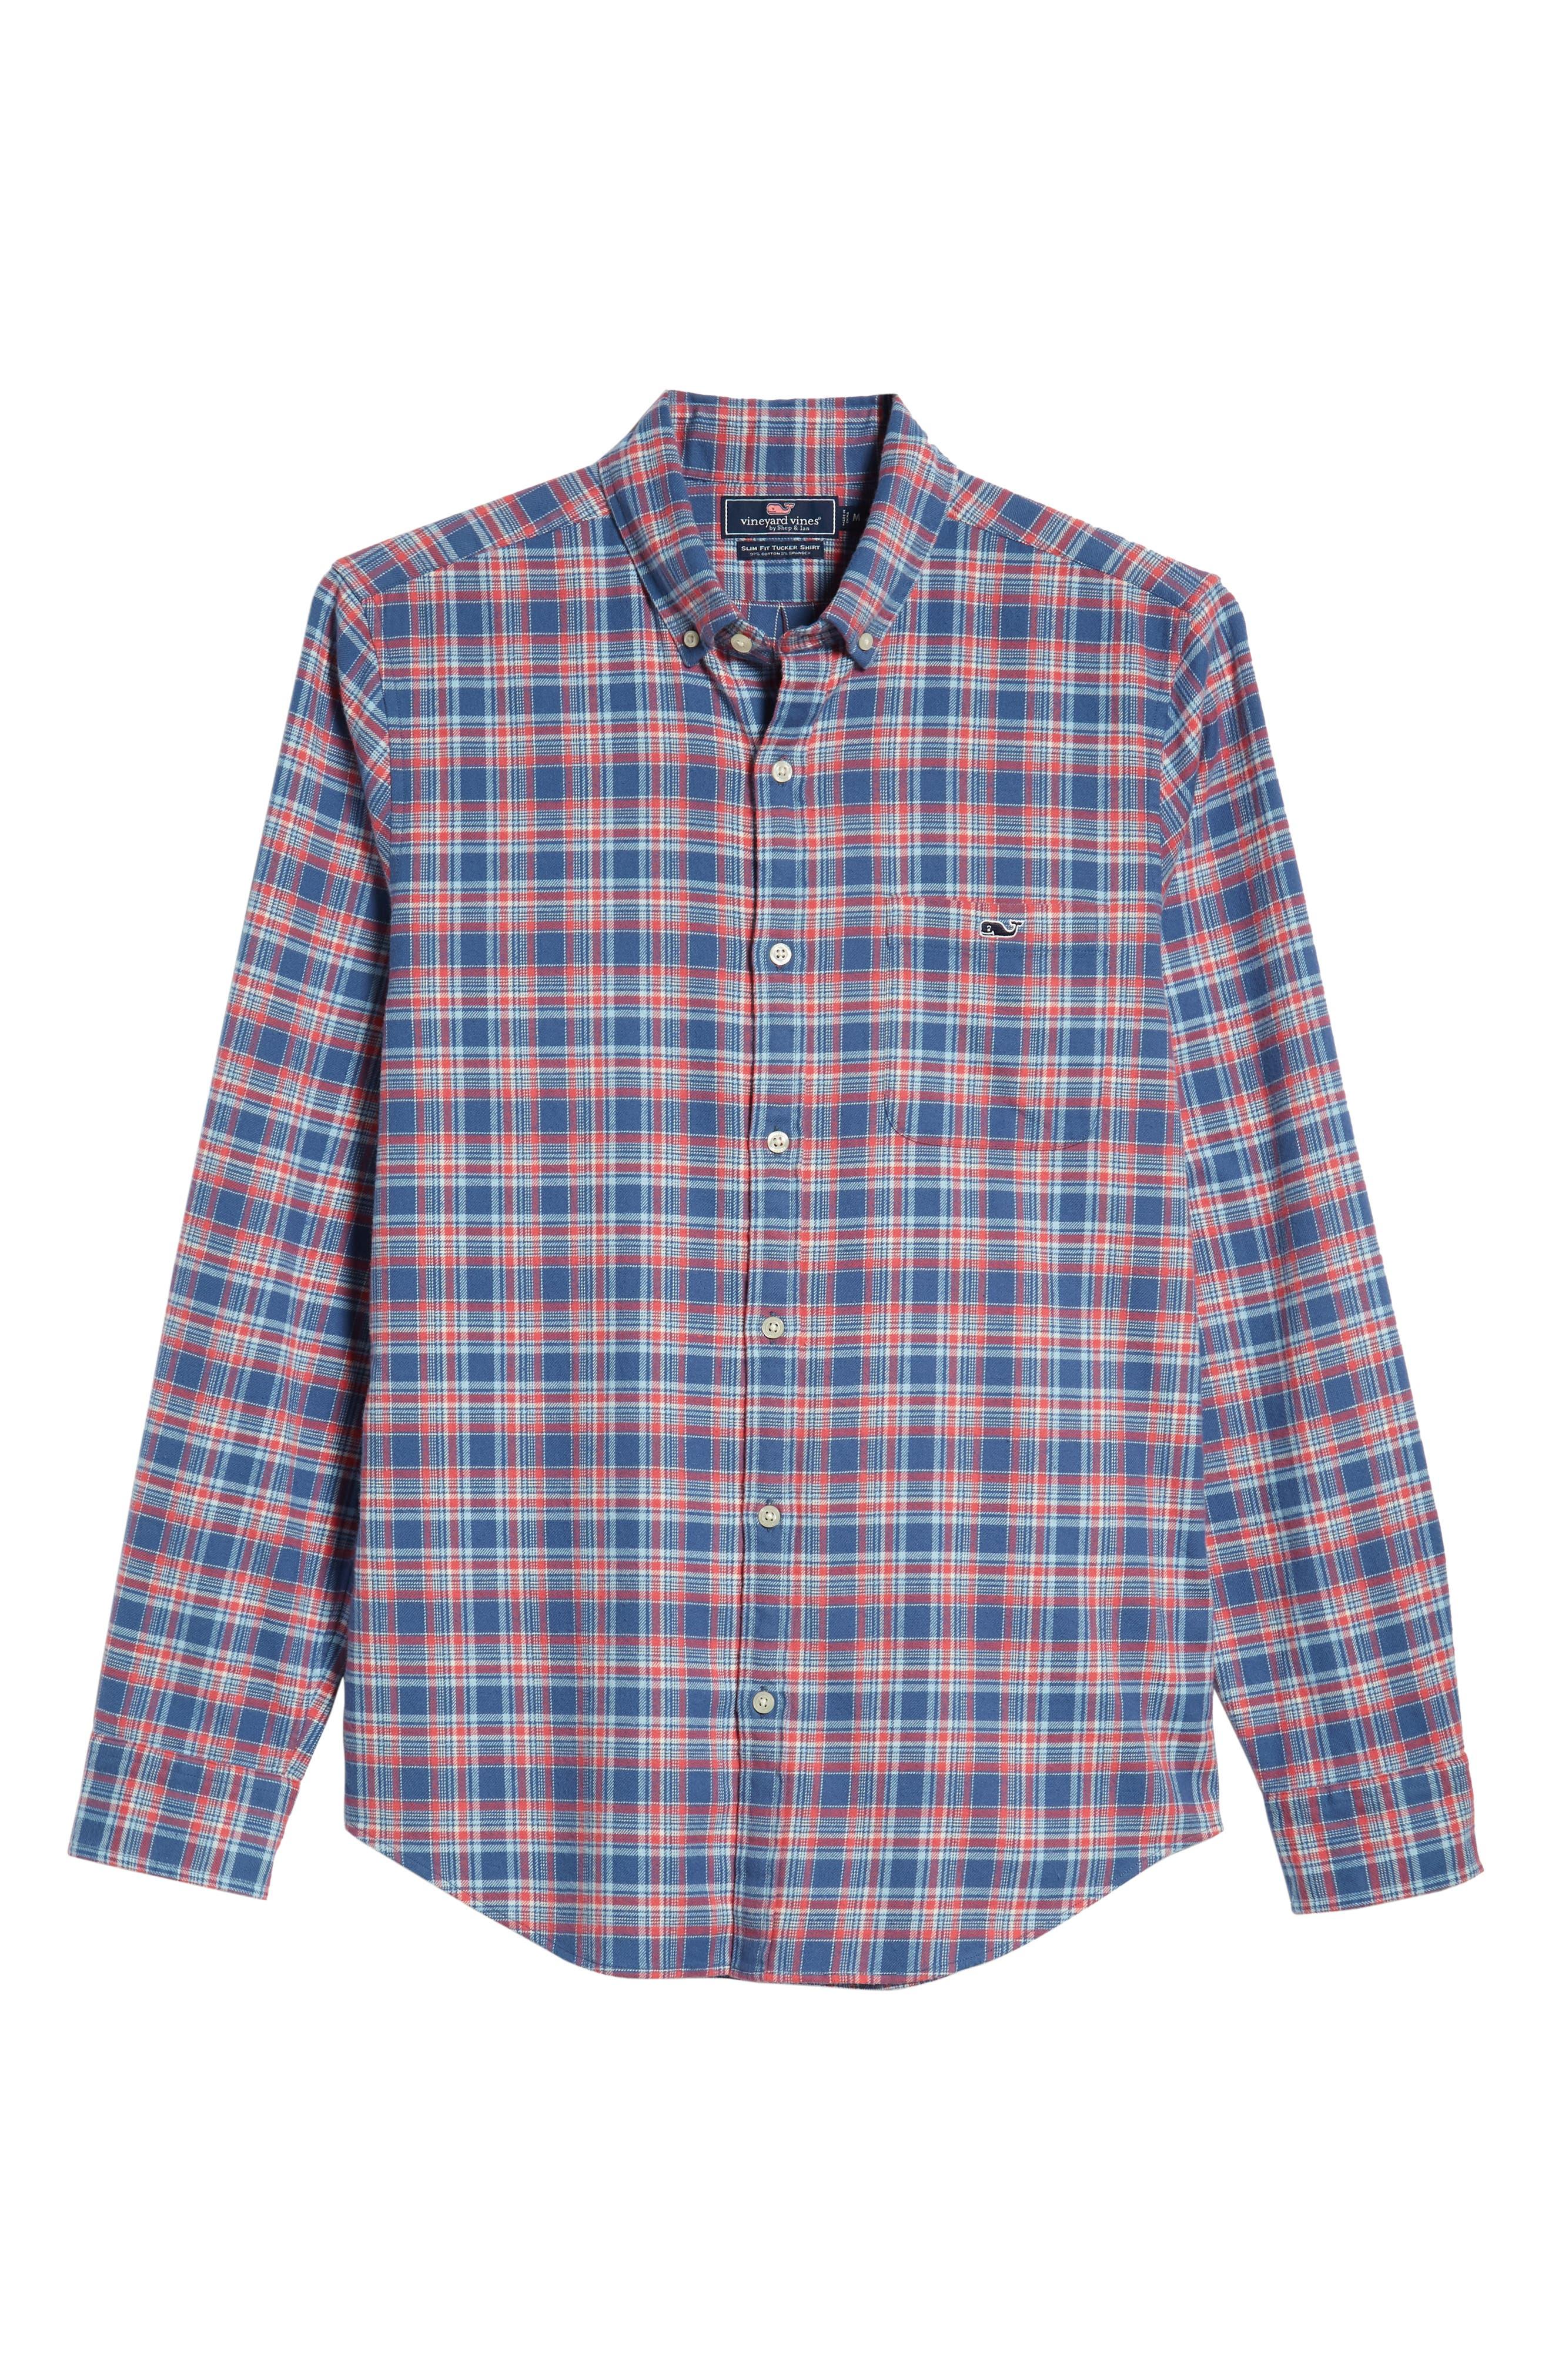 VINEYARD VINES,                             Lockwood Regular Fit Plaid Flannel Shirt,                             Alternate thumbnail 5, color,                             463